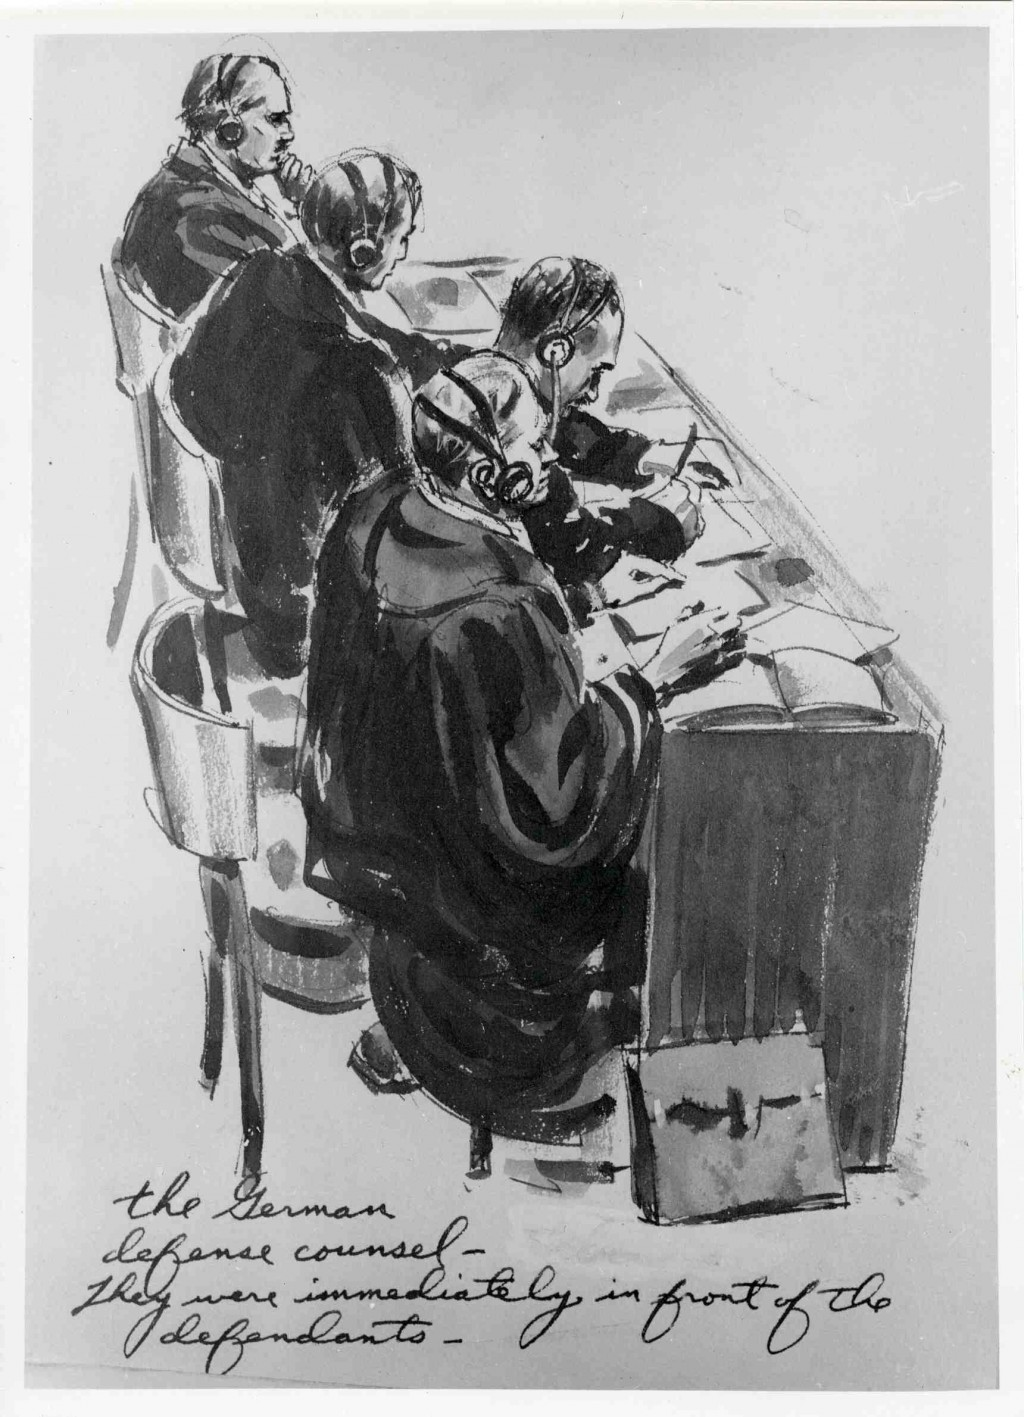 Edward Vebell courtroom sketch [LCID: 2005hy0x]